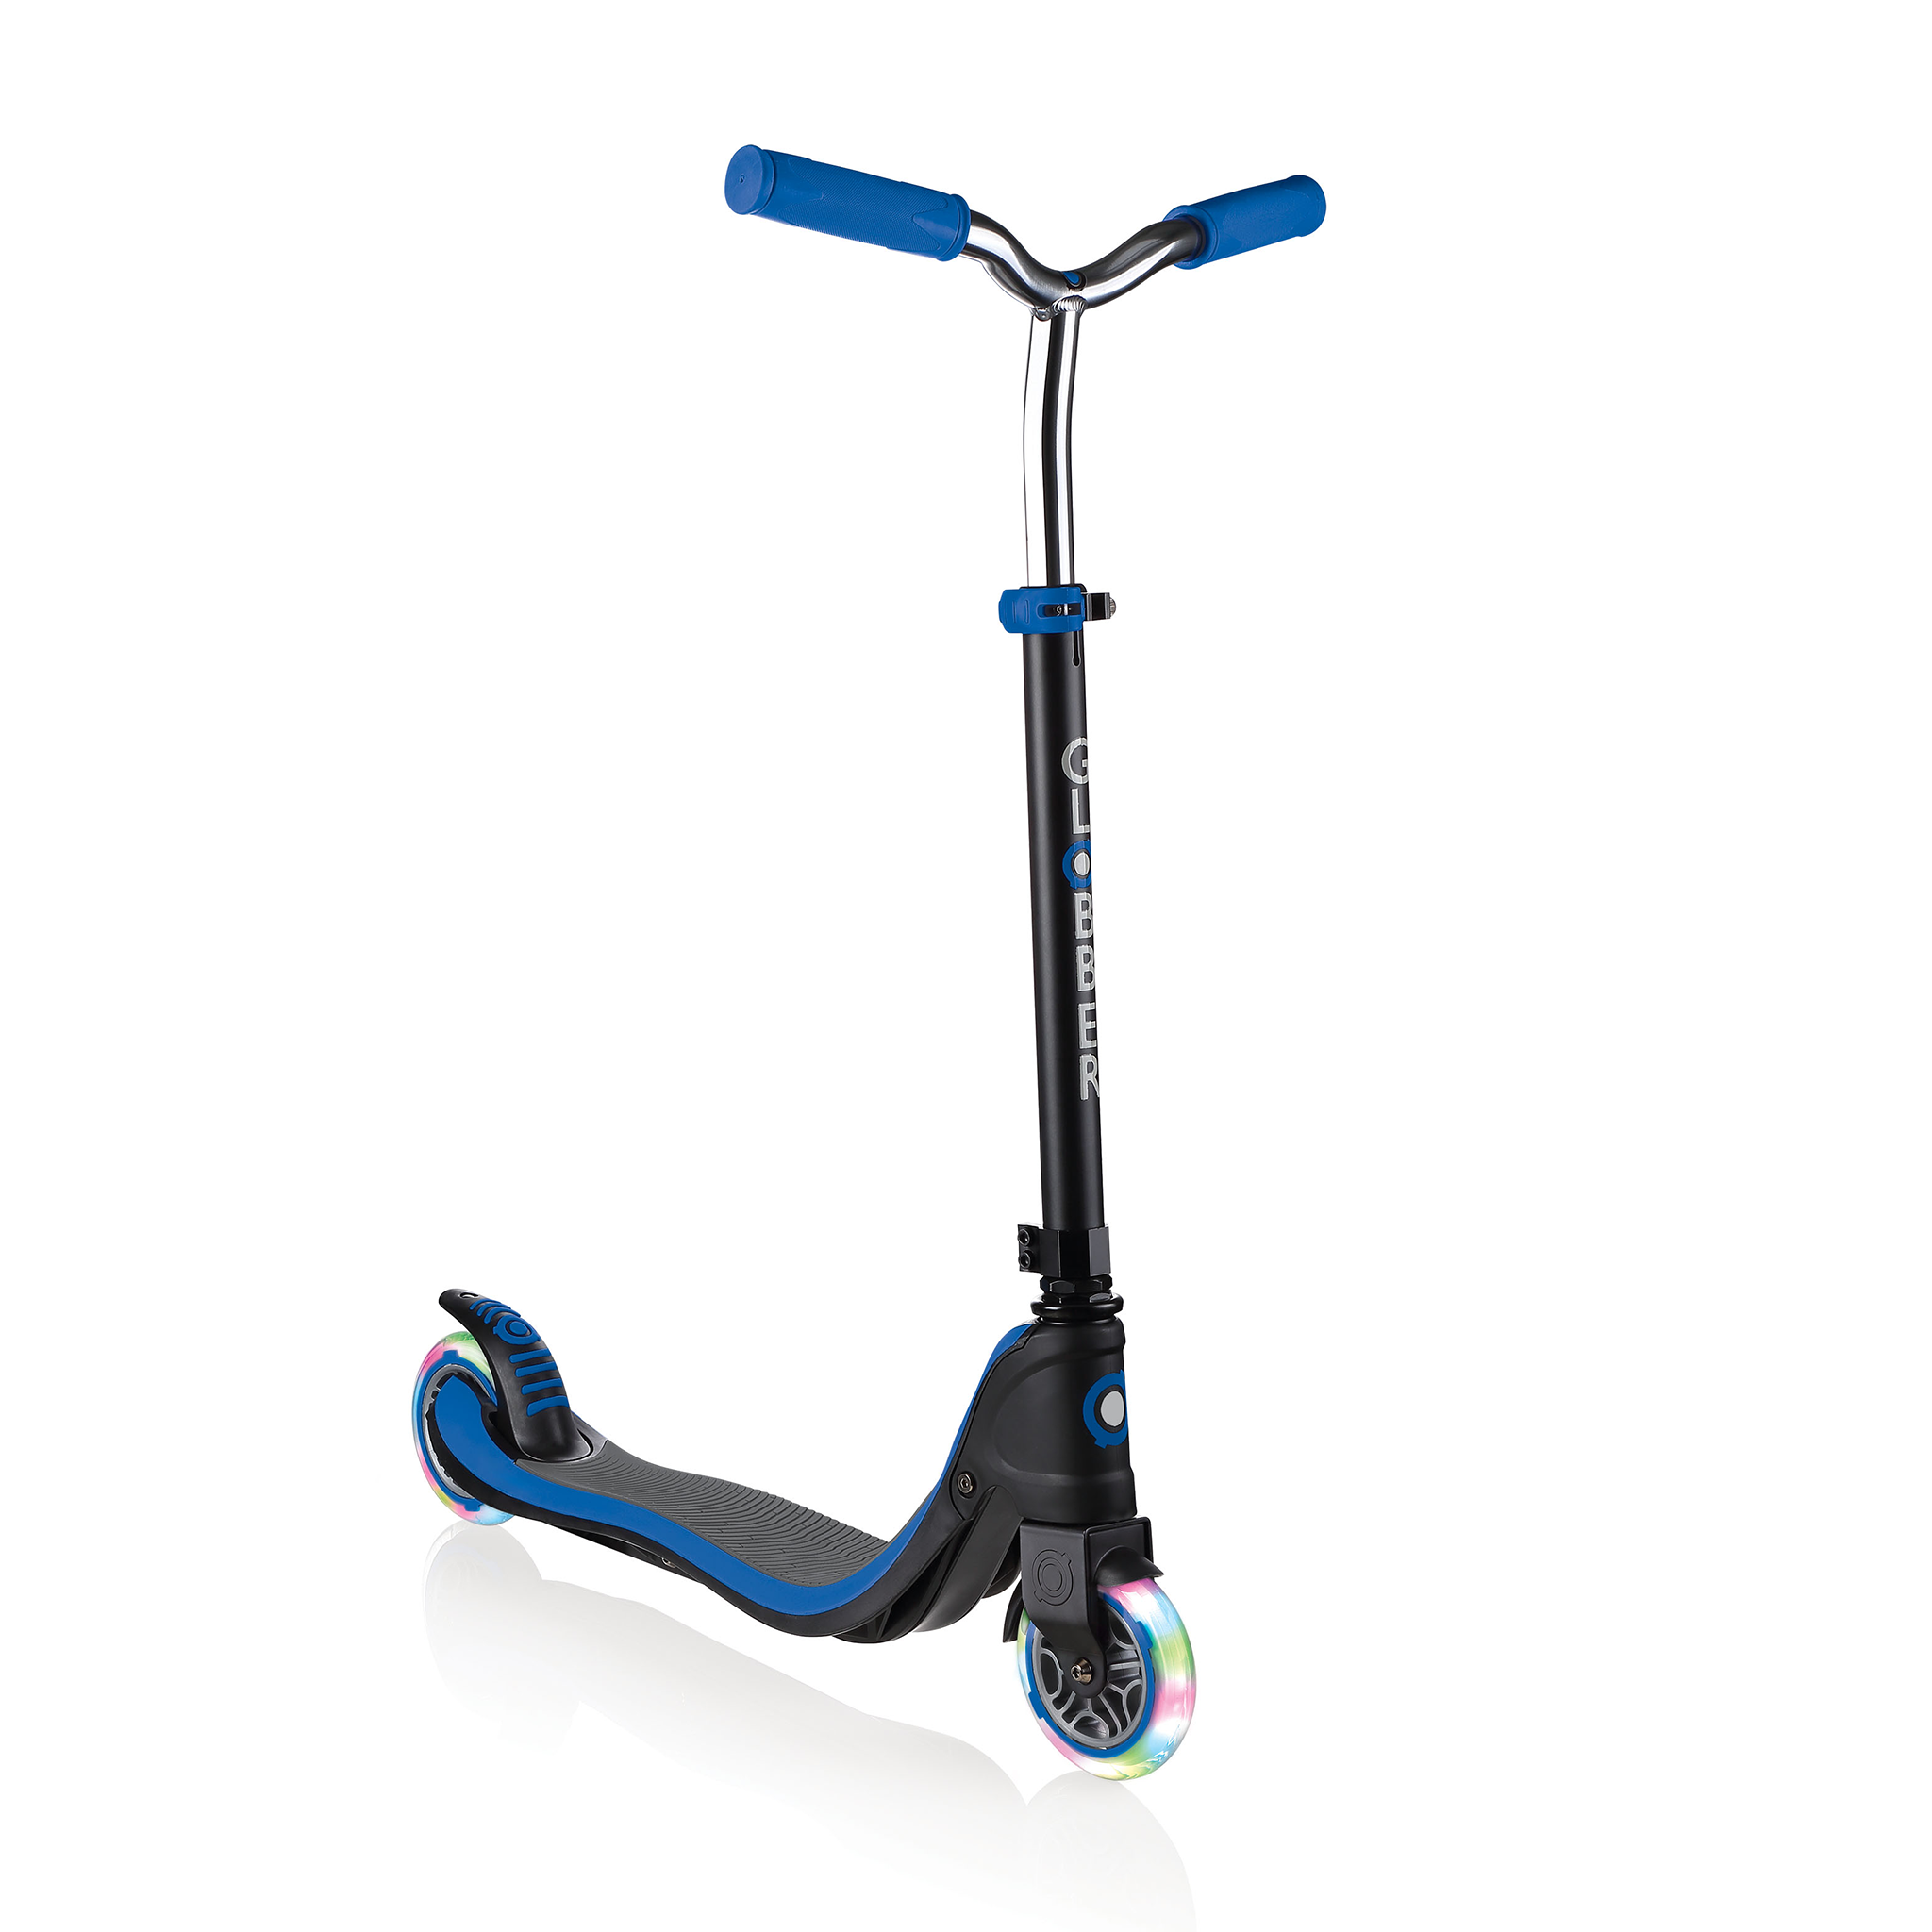 light-up scooter for teenage boy and girl - Globber FLOW 125 LIGHTS 0